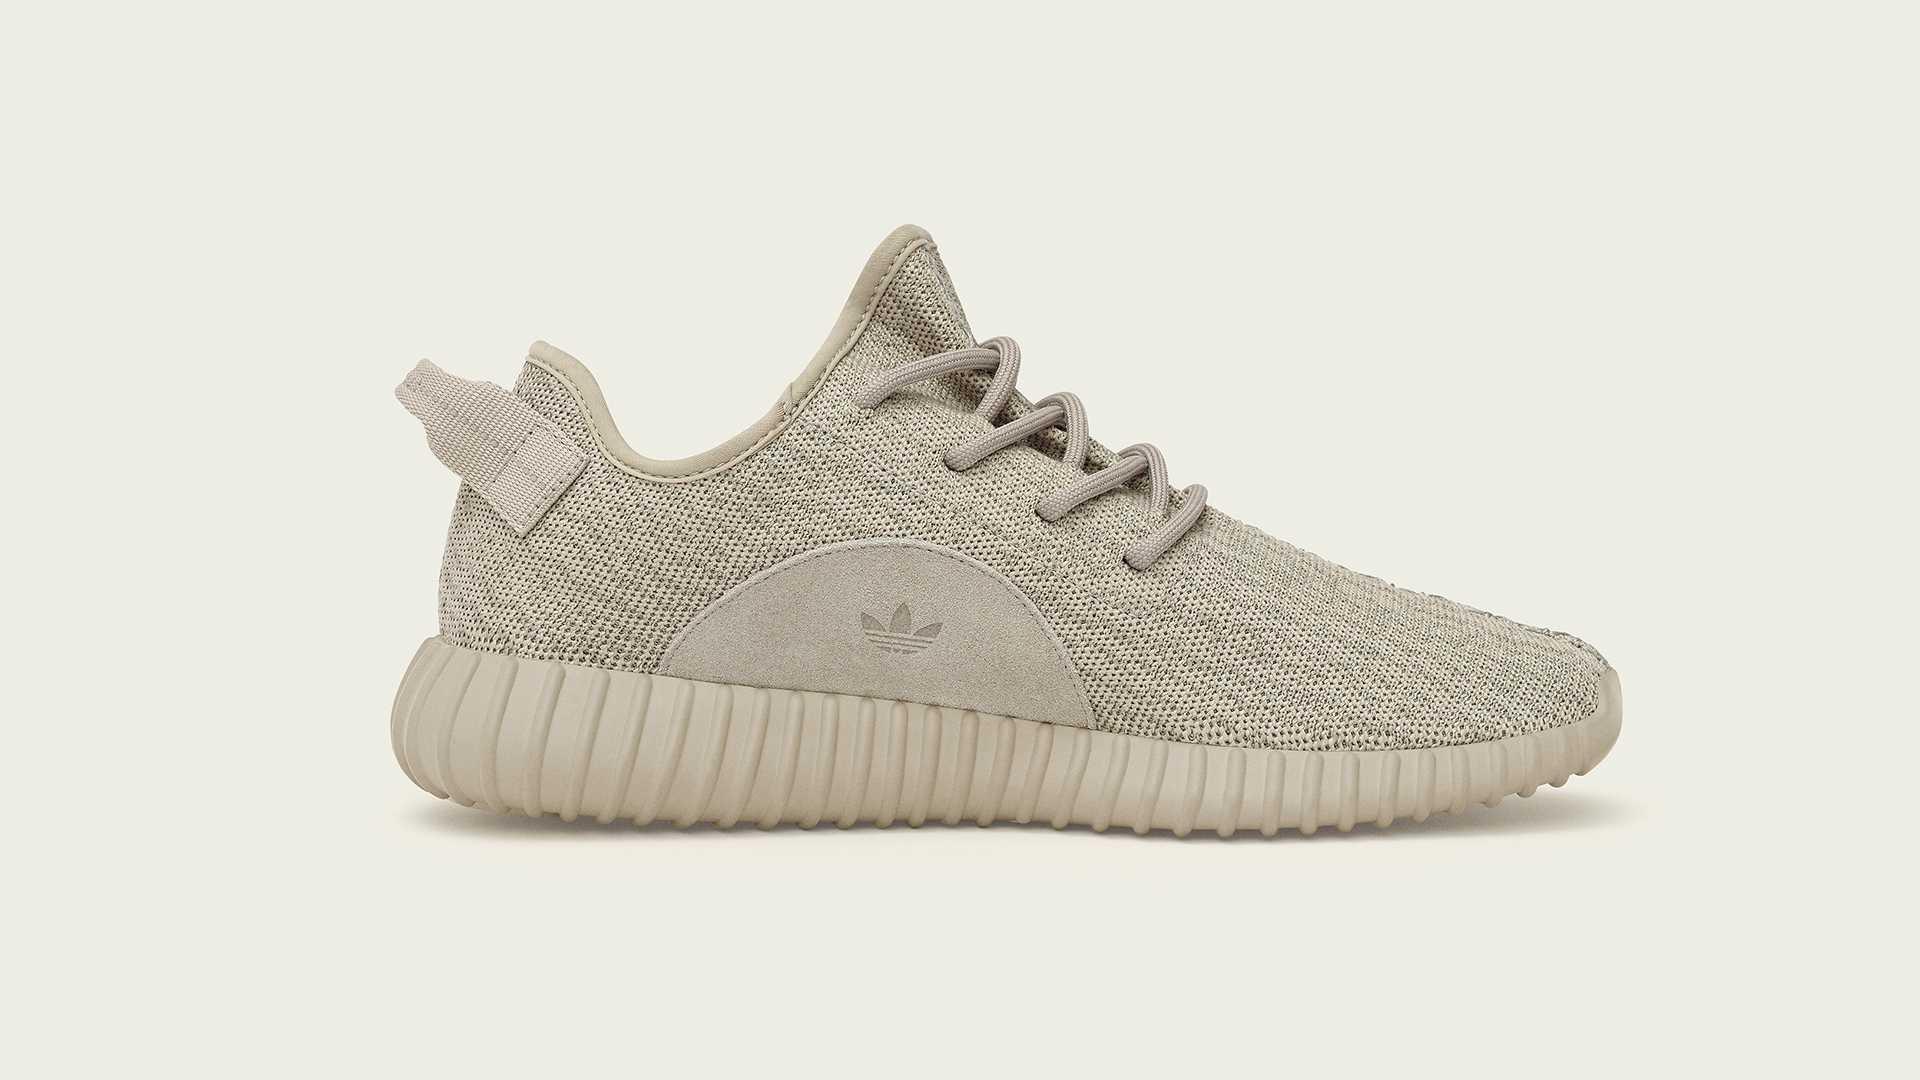 Kanye West New Yeezy Shoes